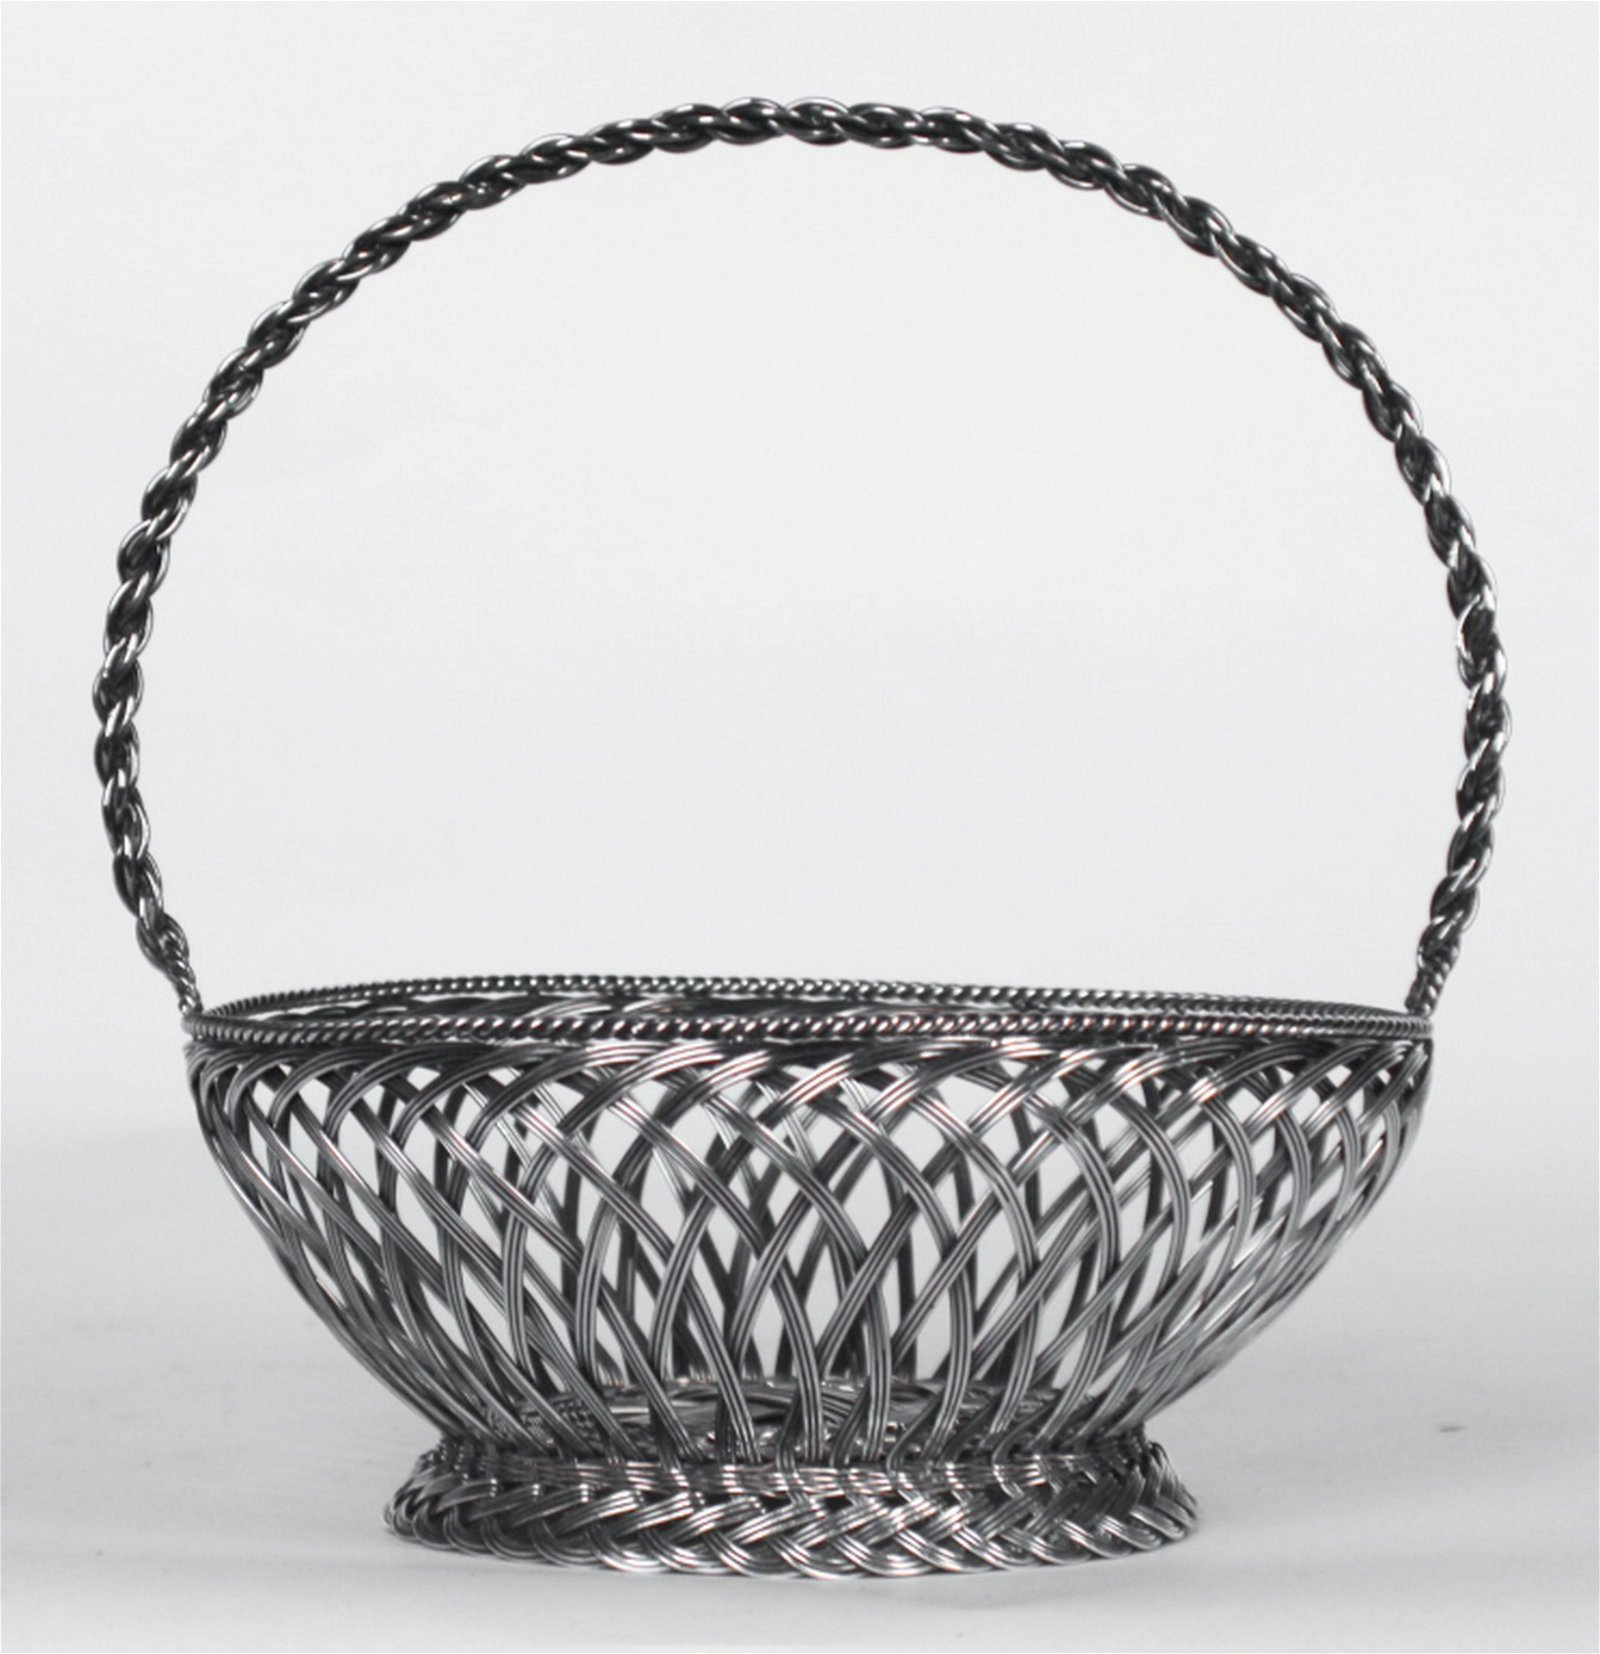 Vintage Tiffany & Company Sterling Woven Basket